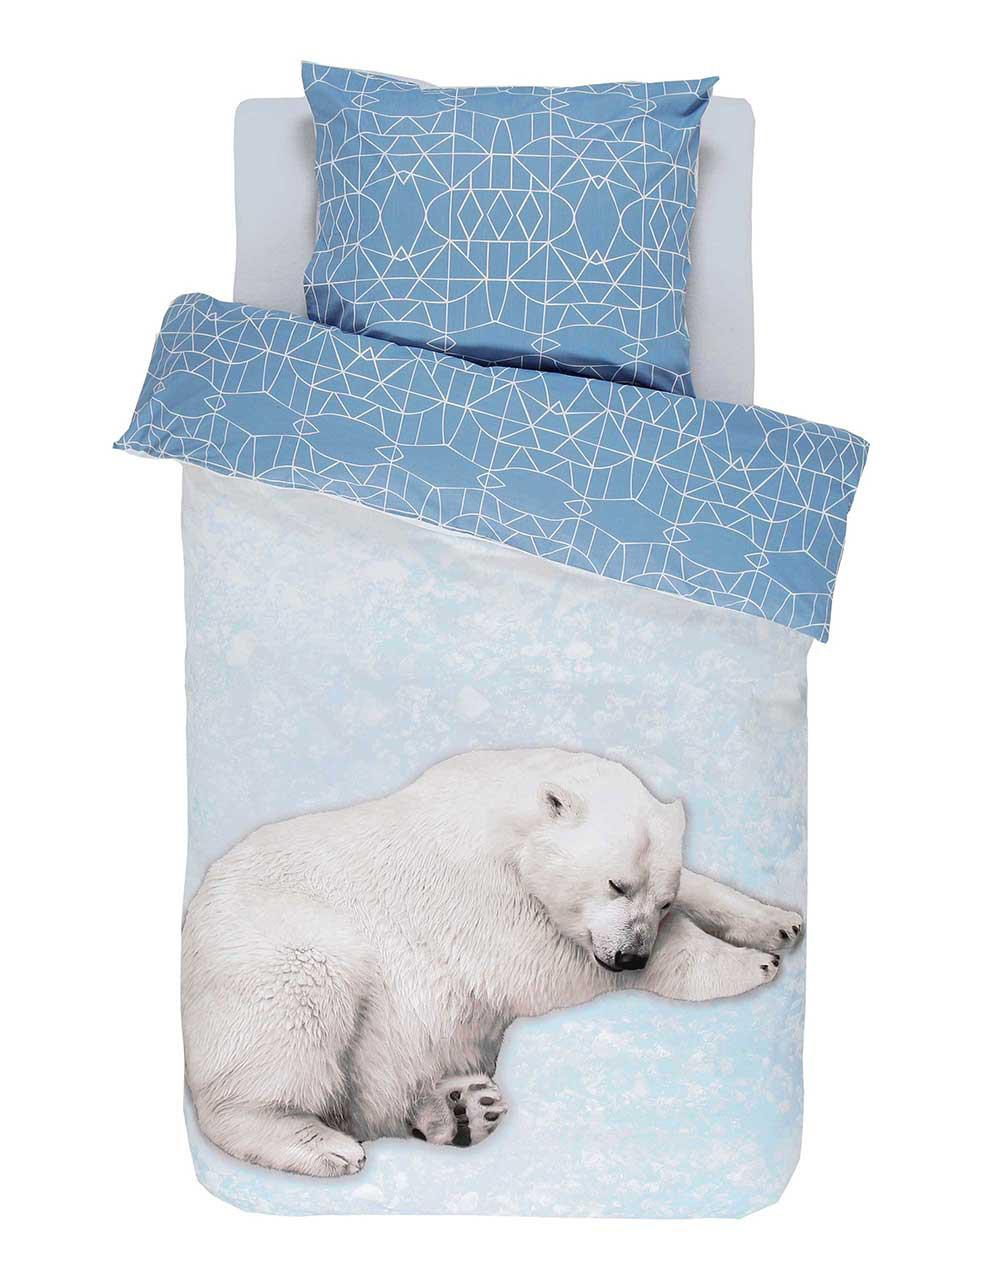 kinderbettw sche baumwolle renforc itsbetter. Black Bedroom Furniture Sets. Home Design Ideas